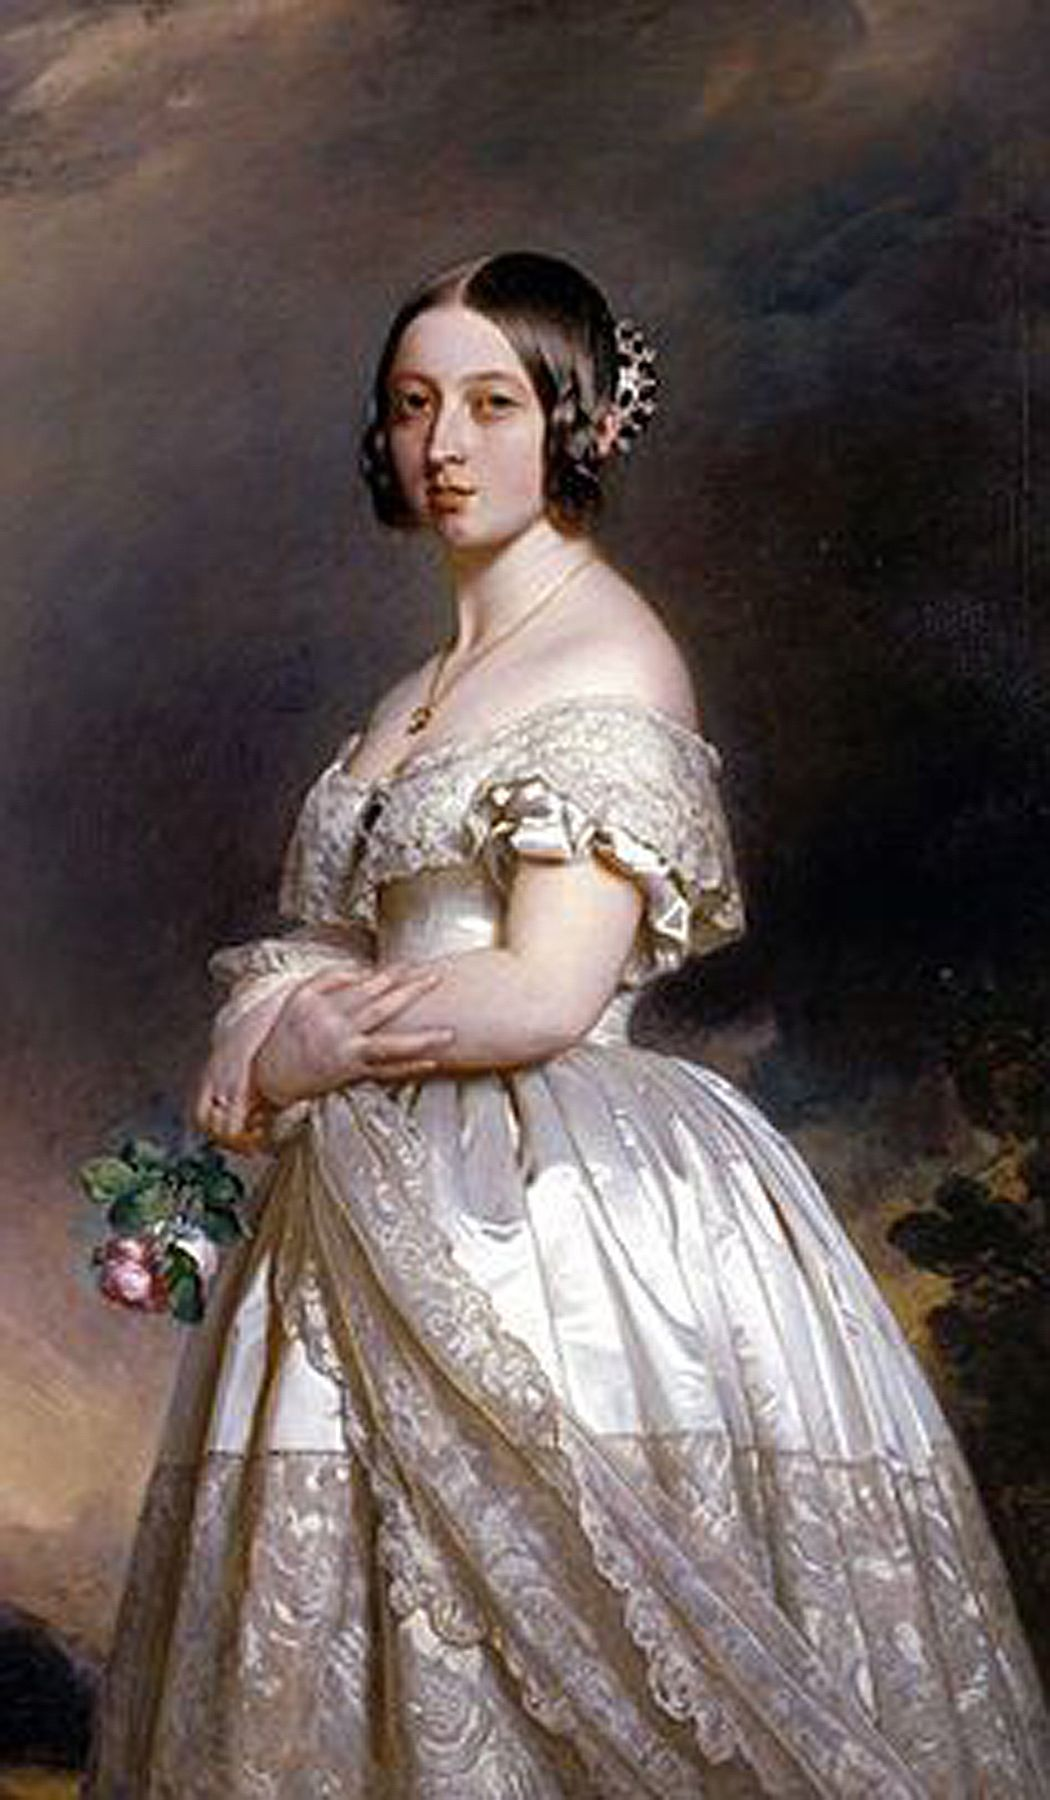 Queen Victoria In Her Wedding Dress By Winterhalter 1842 Queen Victoria Wedding Dress Victoria Wedding Dress Queen Victoria Wedding [ 1800 x 1050 Pixel ]